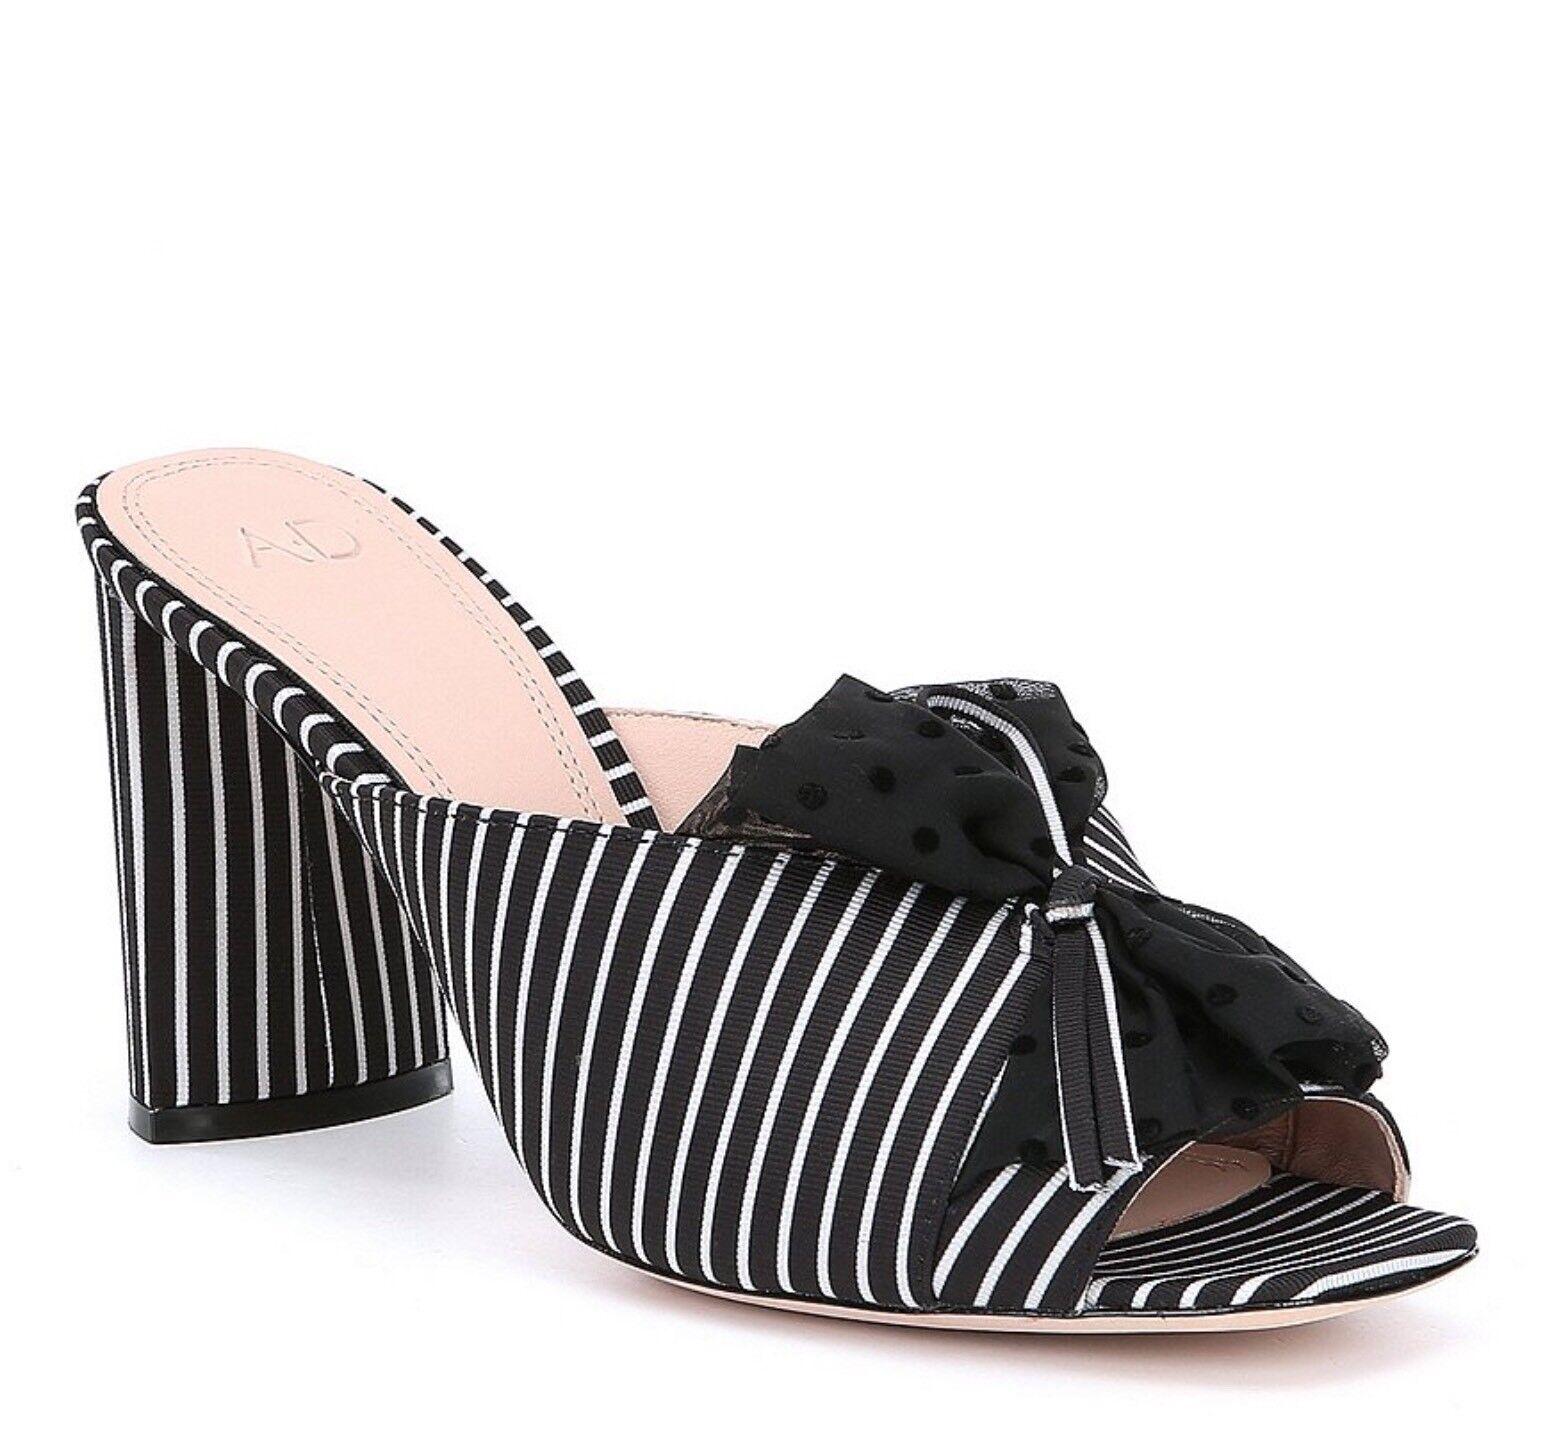 AD & Daughters warmack Stripe Ruffle Detail Block Heel Dress Mules MSRP 180.00